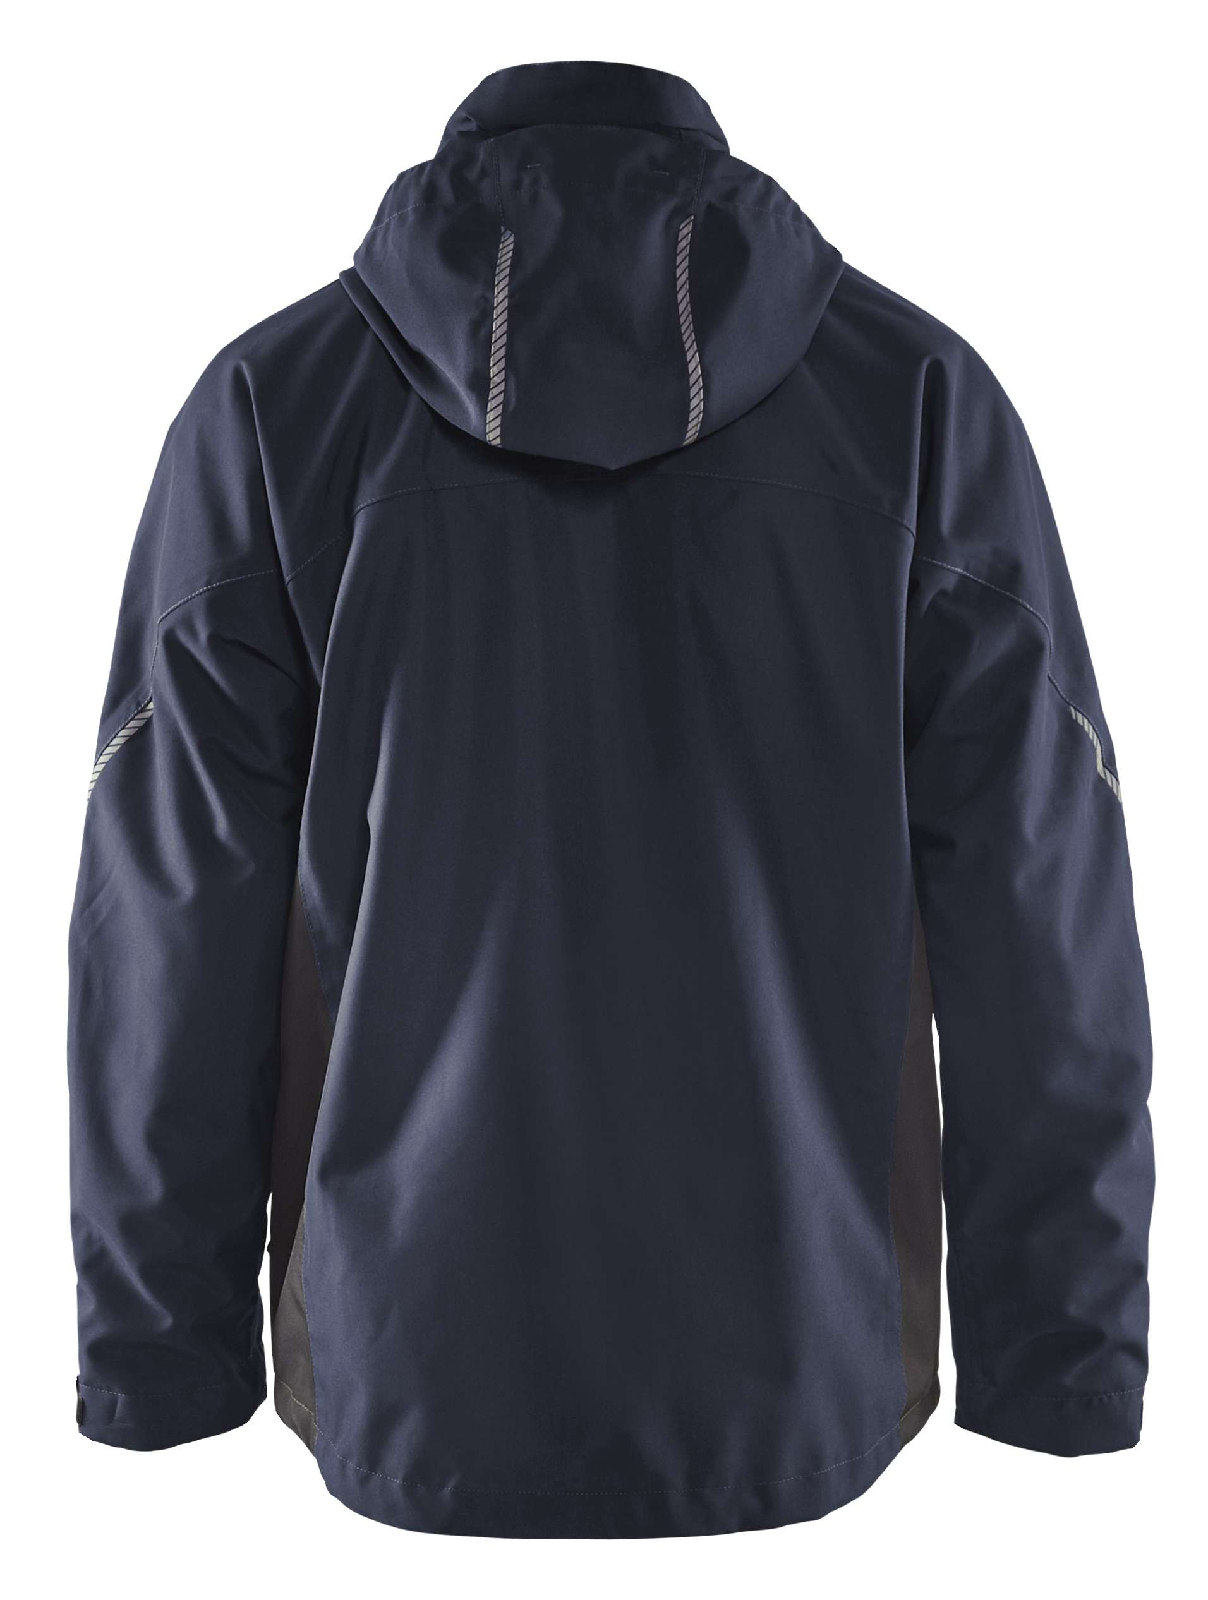 Blaklader Regenjacks 47901977 donker marineblauw-zwart(8699)